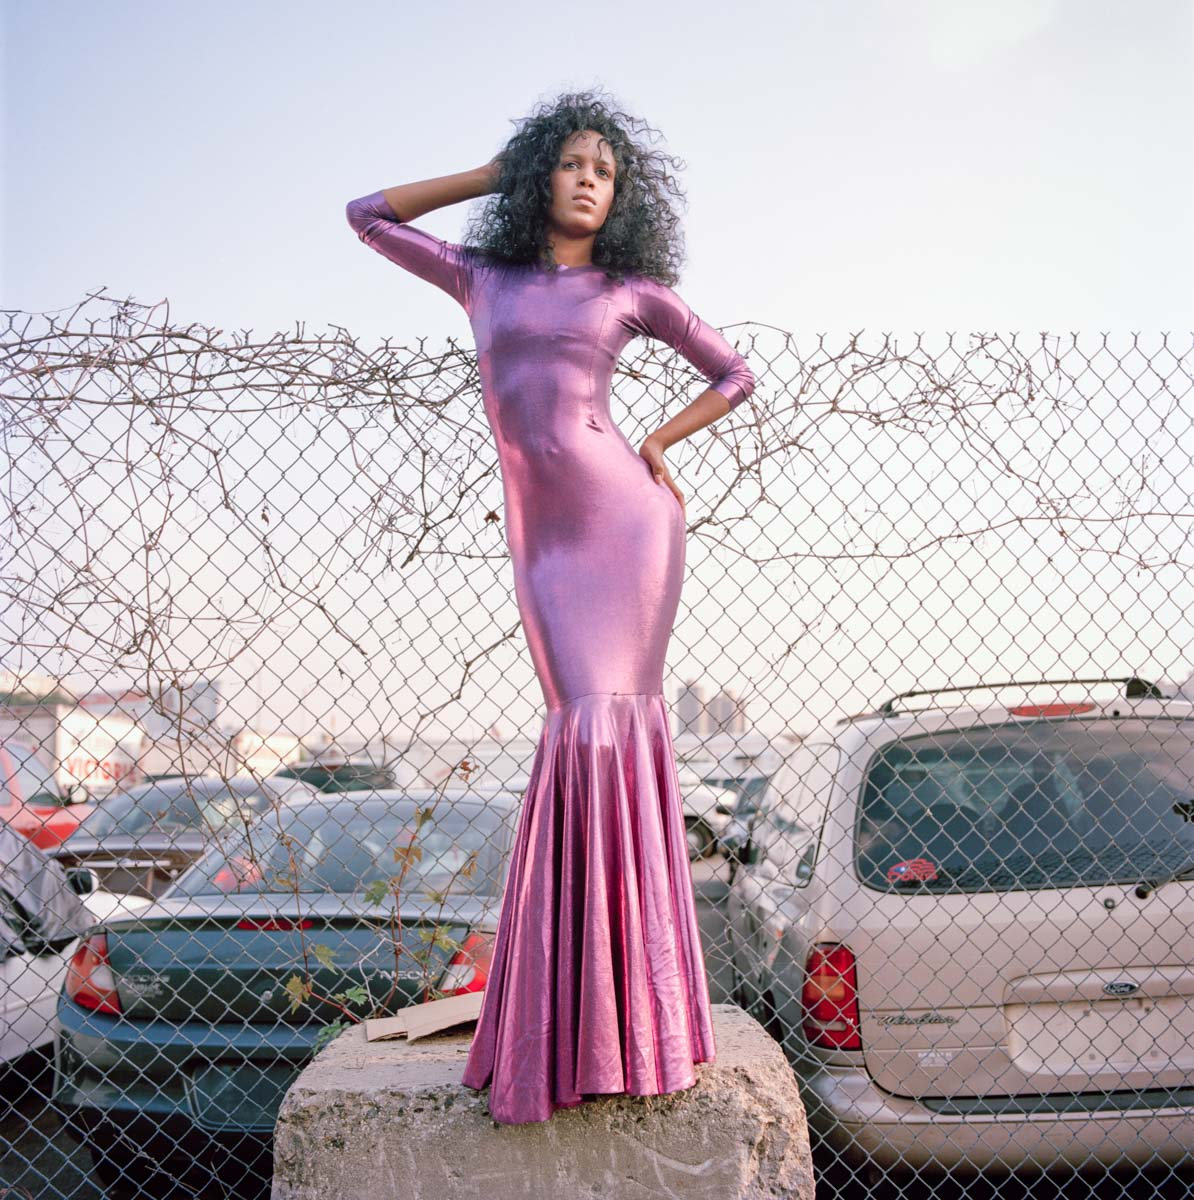 Street Fashion Photography Poses